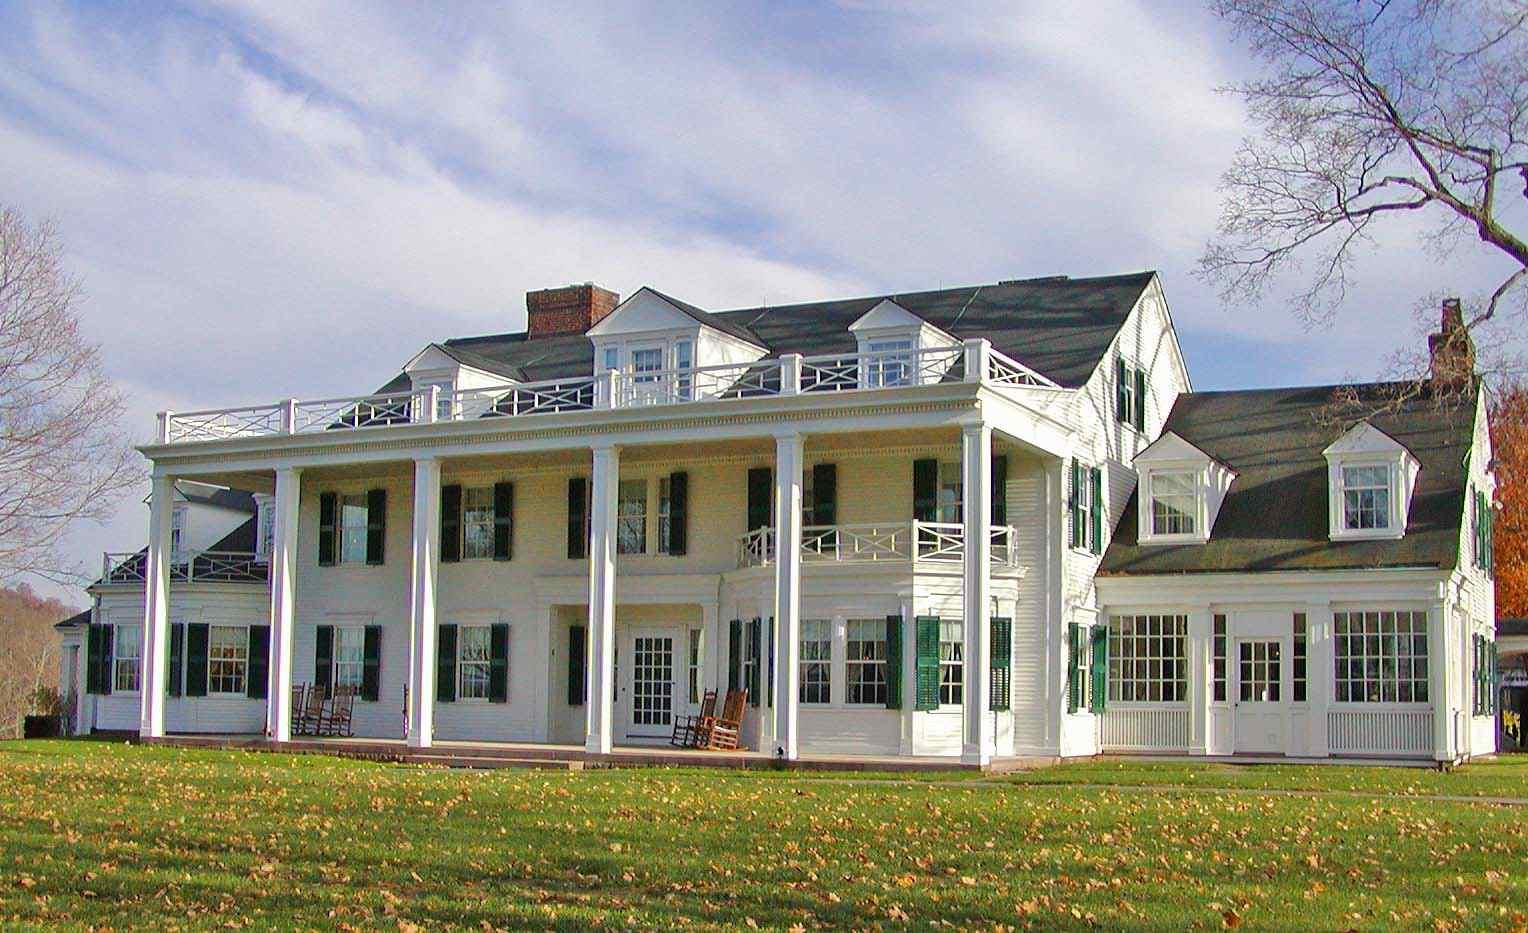 Hill-Stead Museum in Farmington, Connecticut